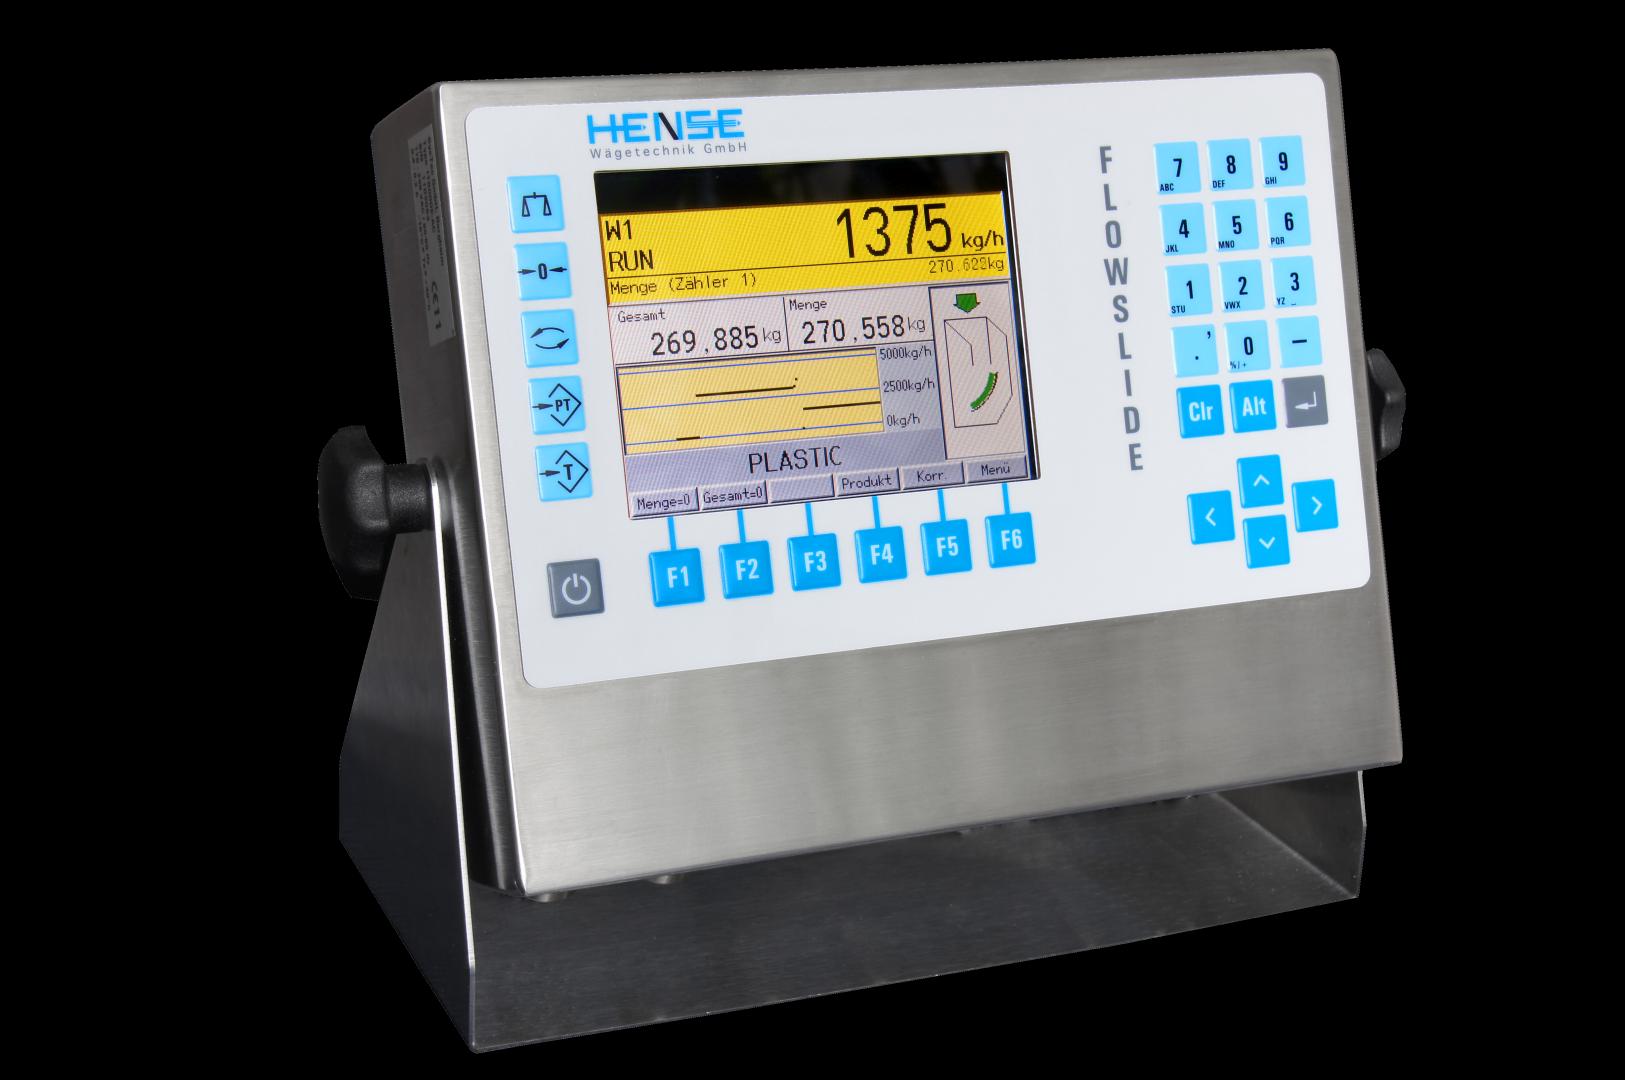 Auswerteelektronik FlowSlide Amplifier Verstärker Messverstärker Waage Durchflussmessung